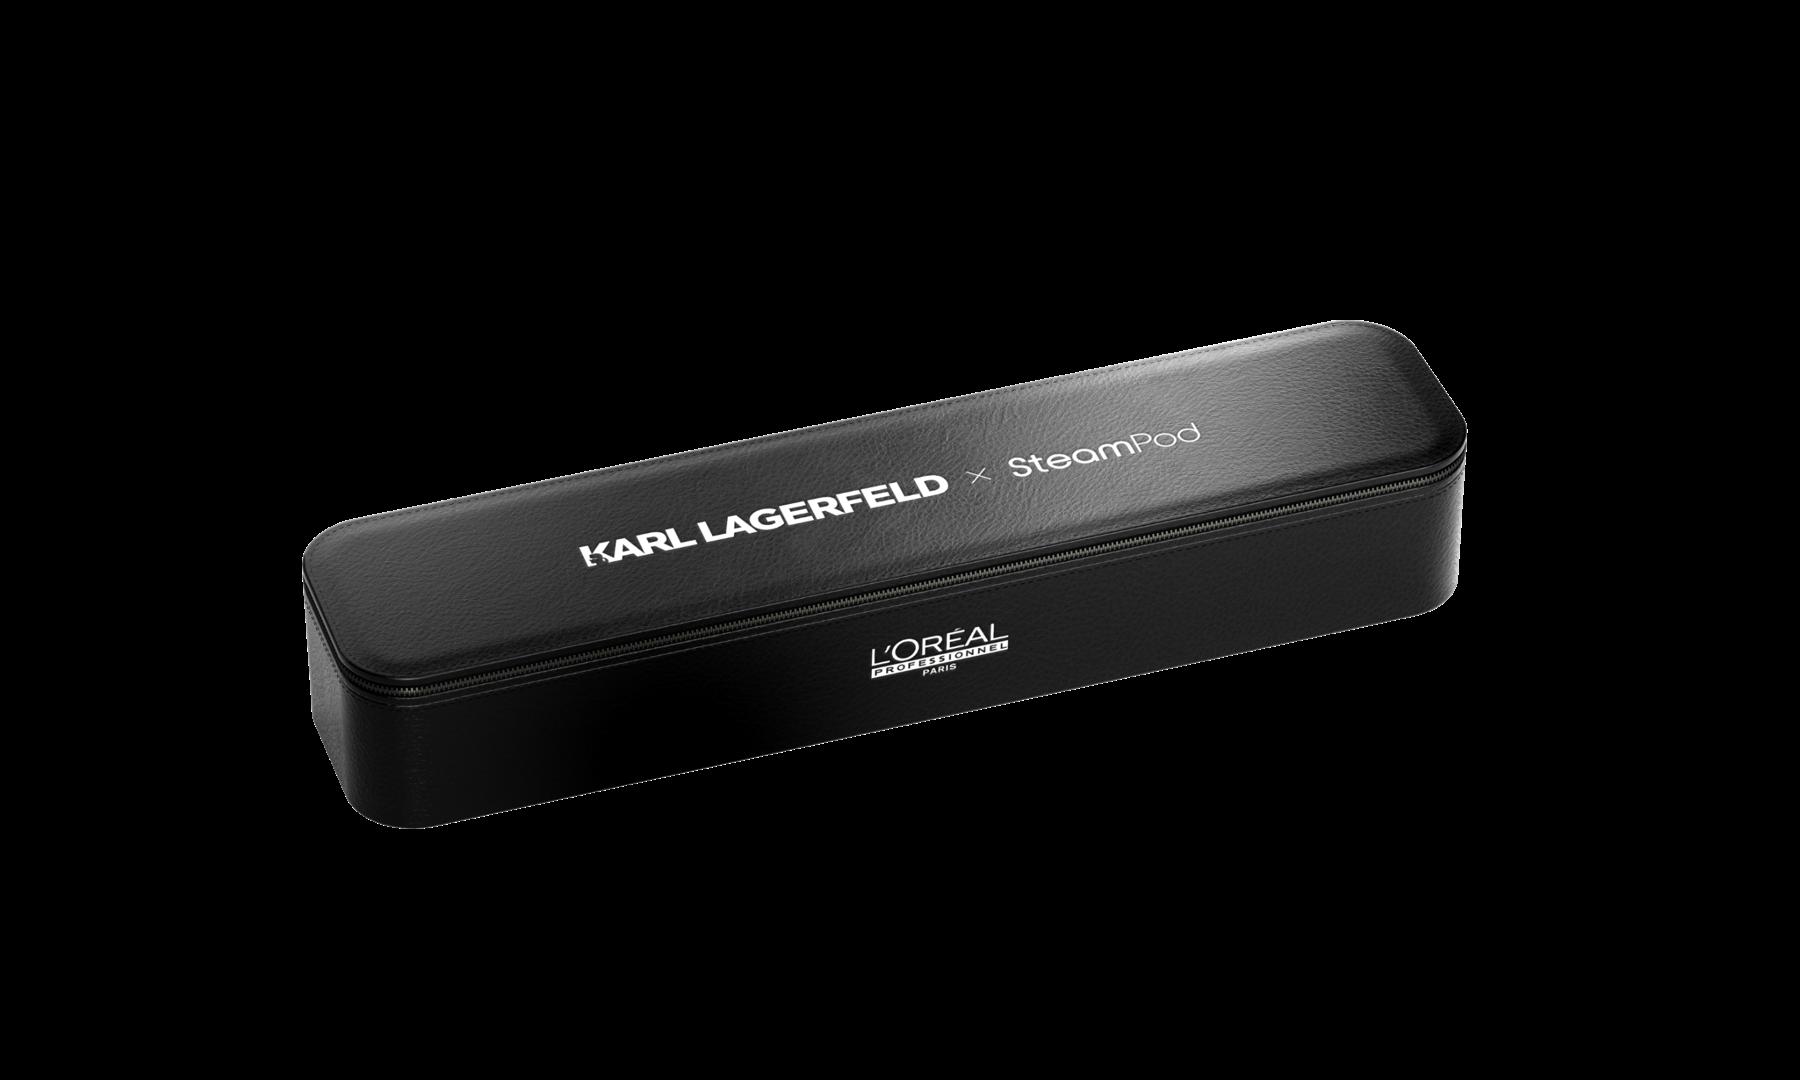 Piastra SteamPod L'Oréal Professionnel Karl Lagerfeld